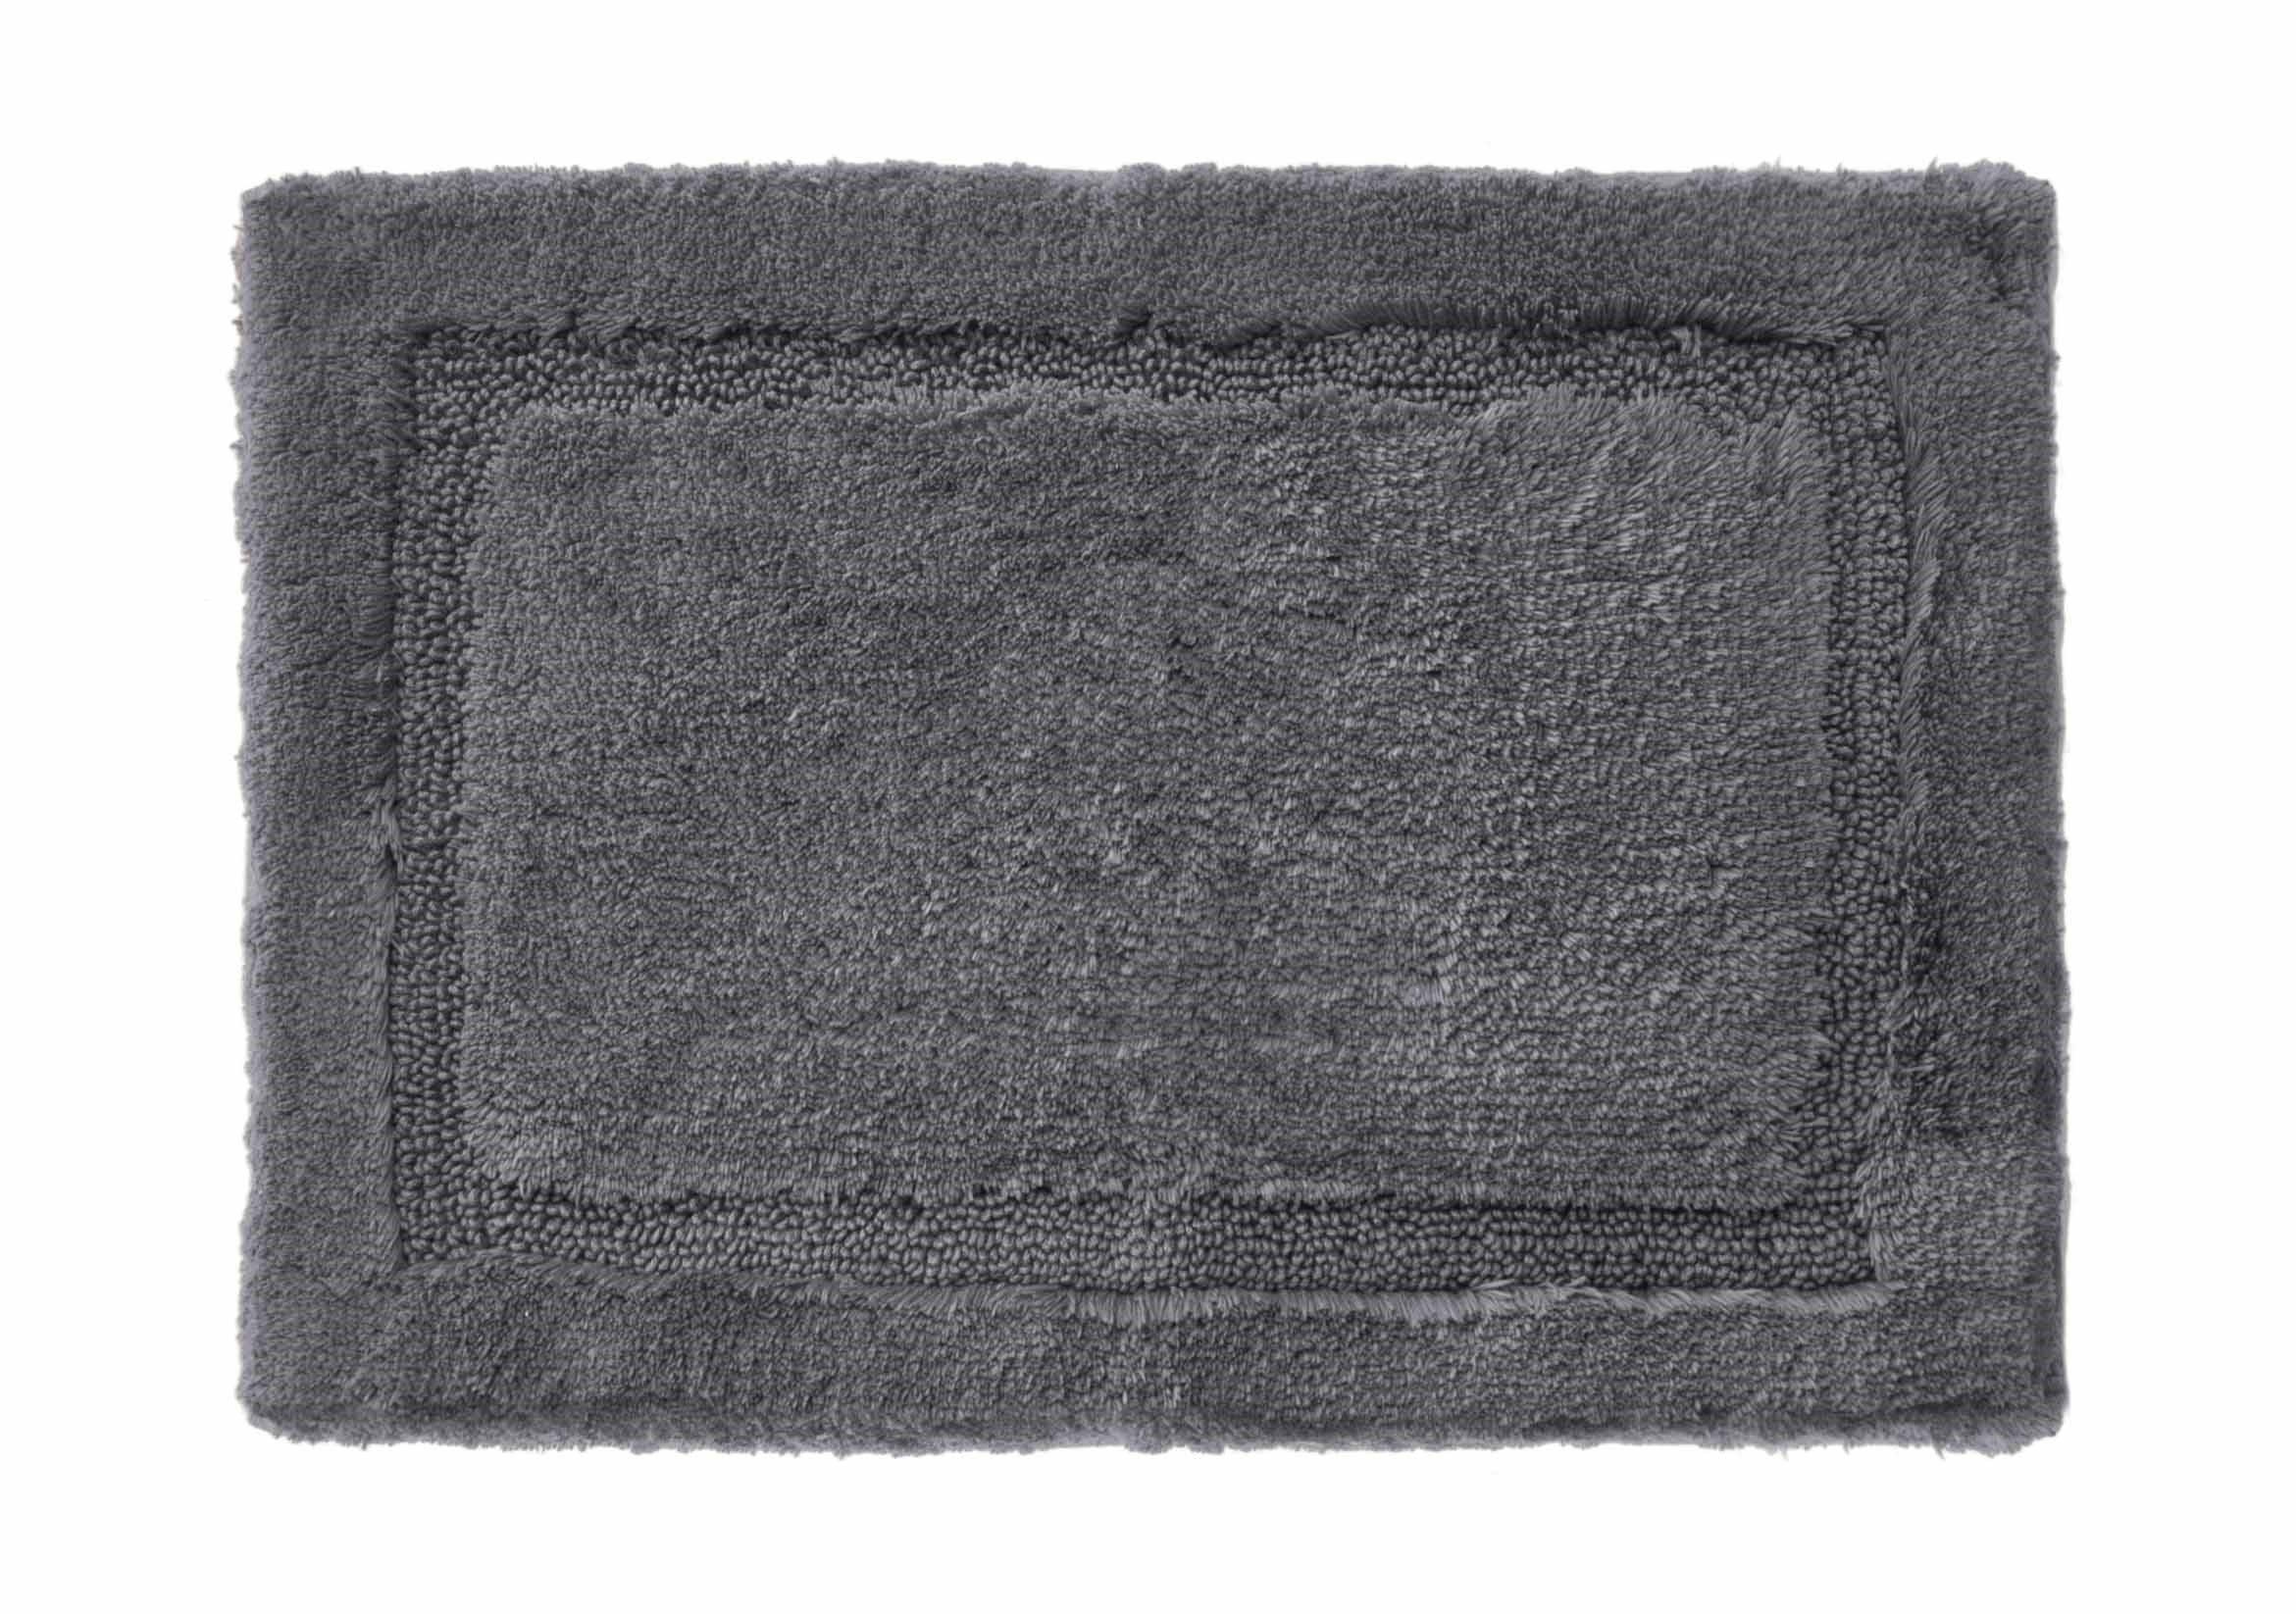 Grund Asheville mat, Bath Rug, 21 by 34-Inch, Slate Gray